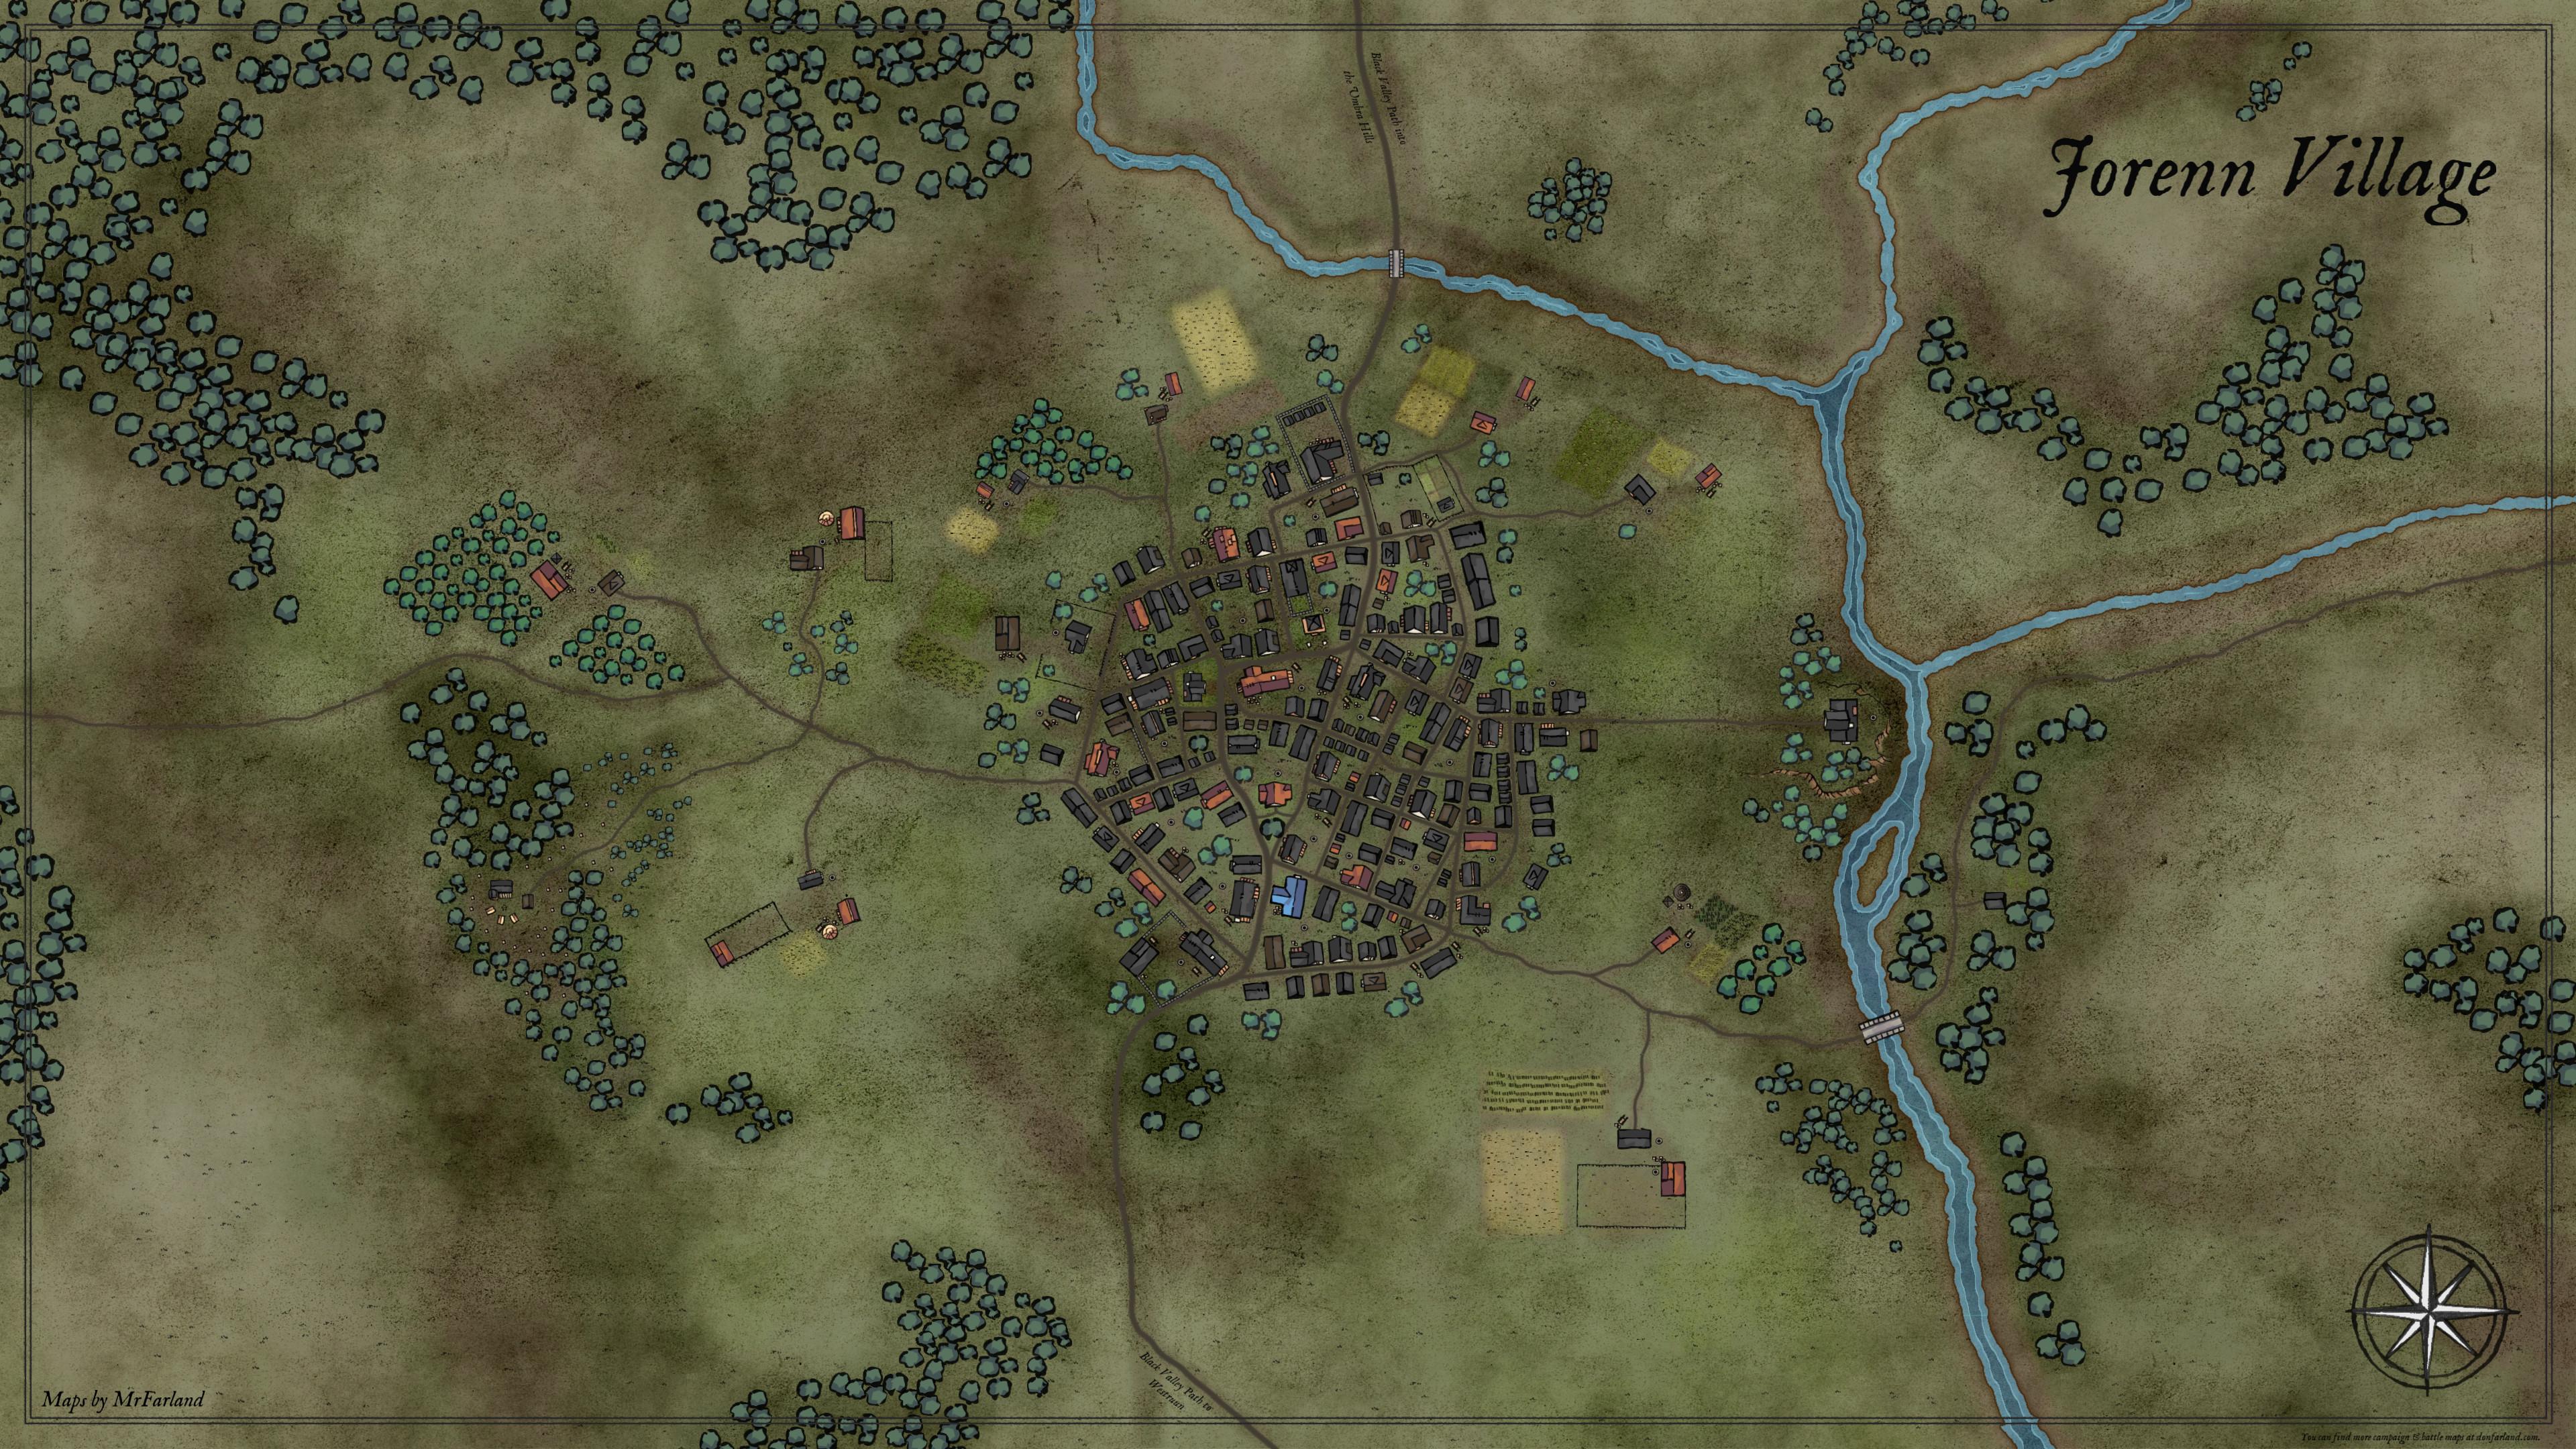 Jorenn Village